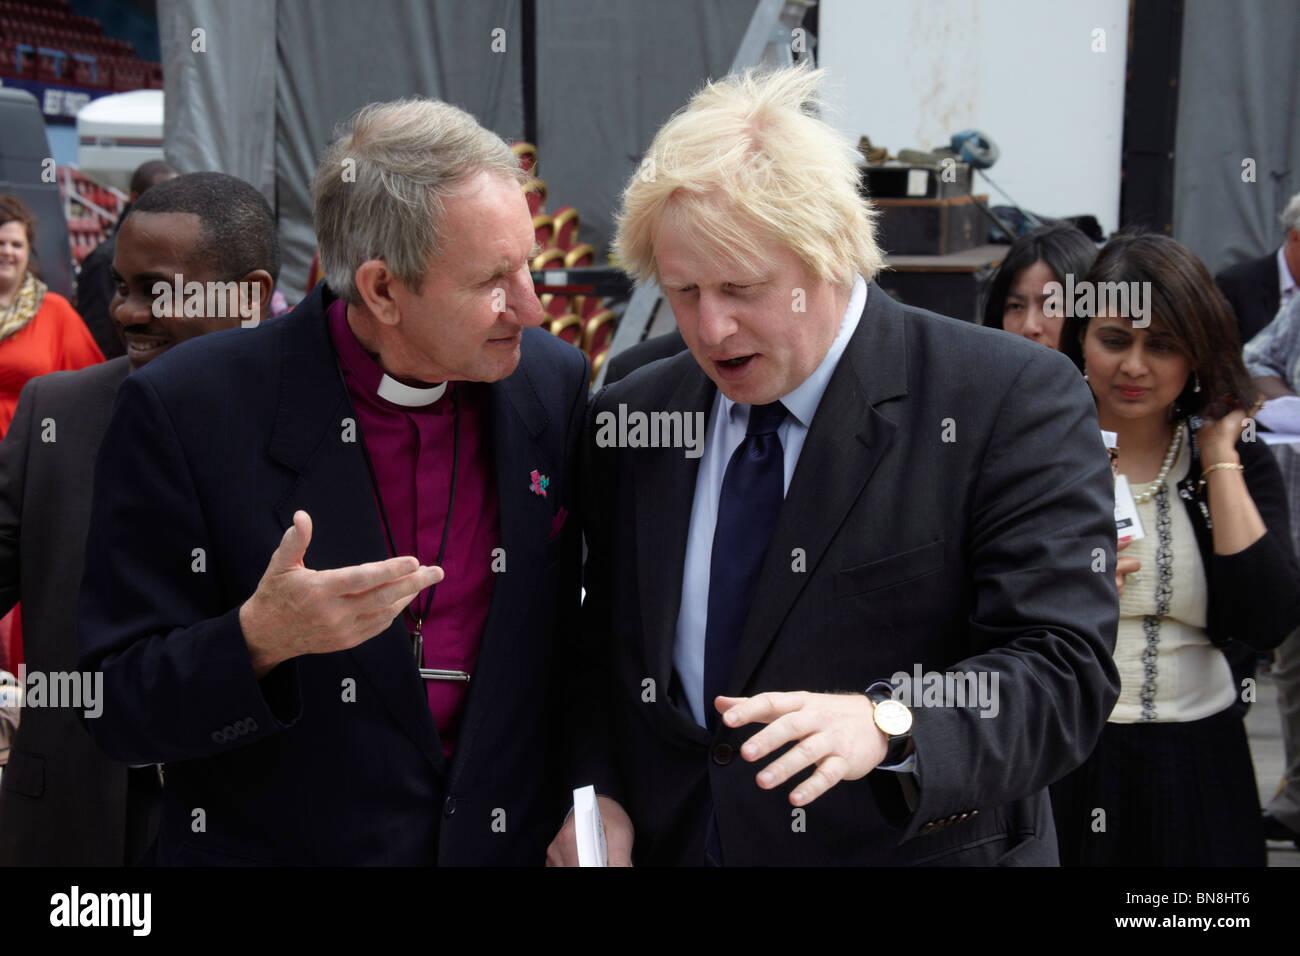 Rt Revd David Hawkins, Bishop of Barking, with Boris Johnson, Mayor of London, at the 2010 London Global Day of - Stock Image